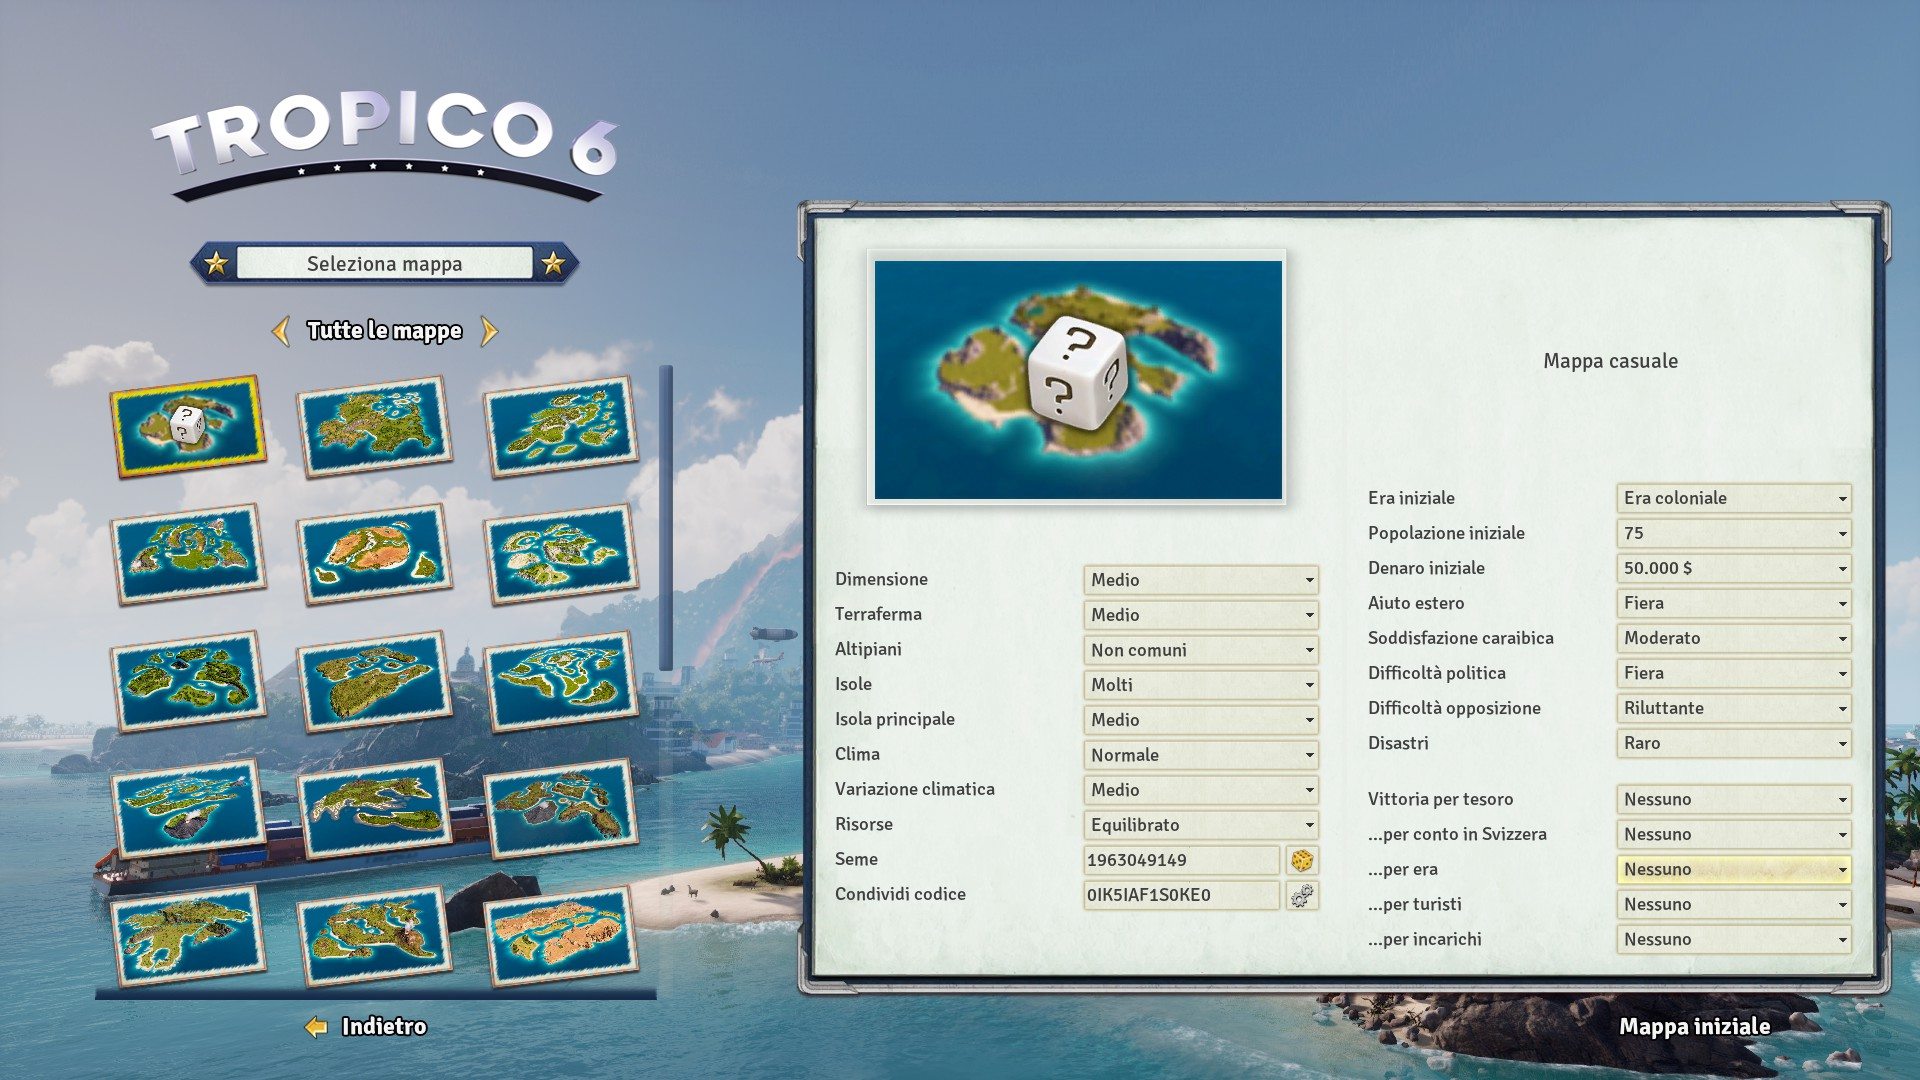 Tropico 6 Sandbox